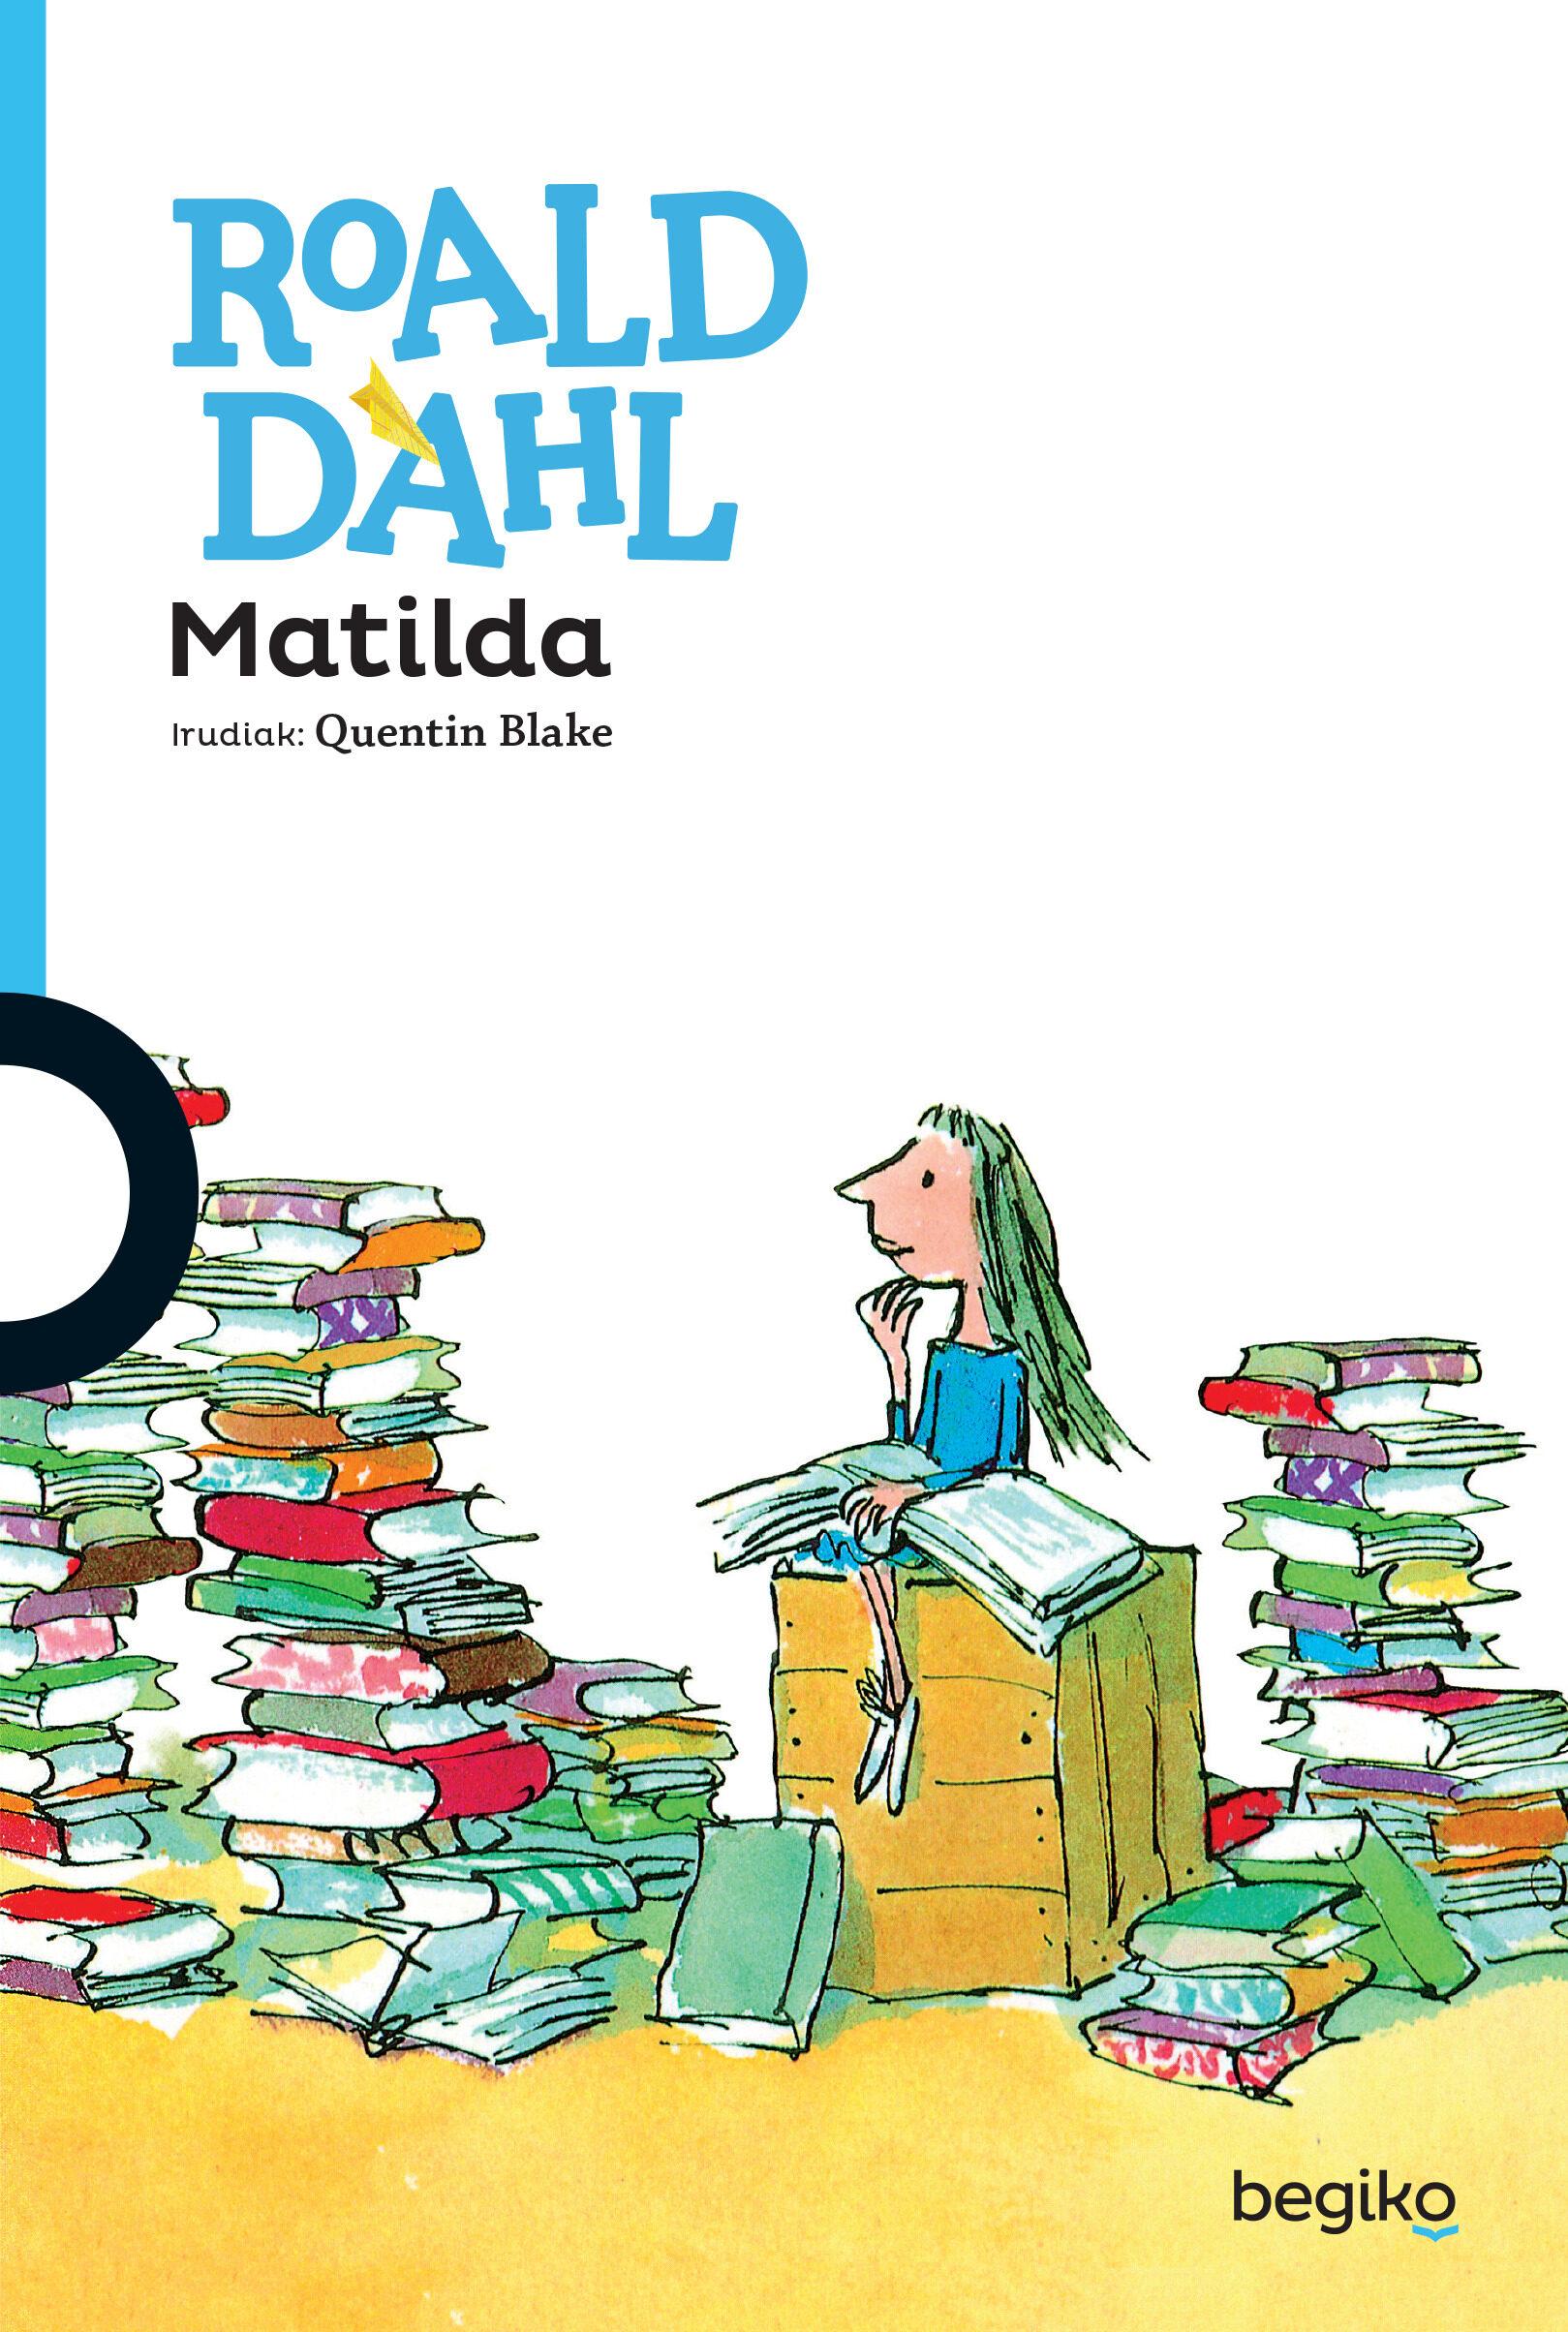 matilda (euskera)-roald dahl-9788416839223